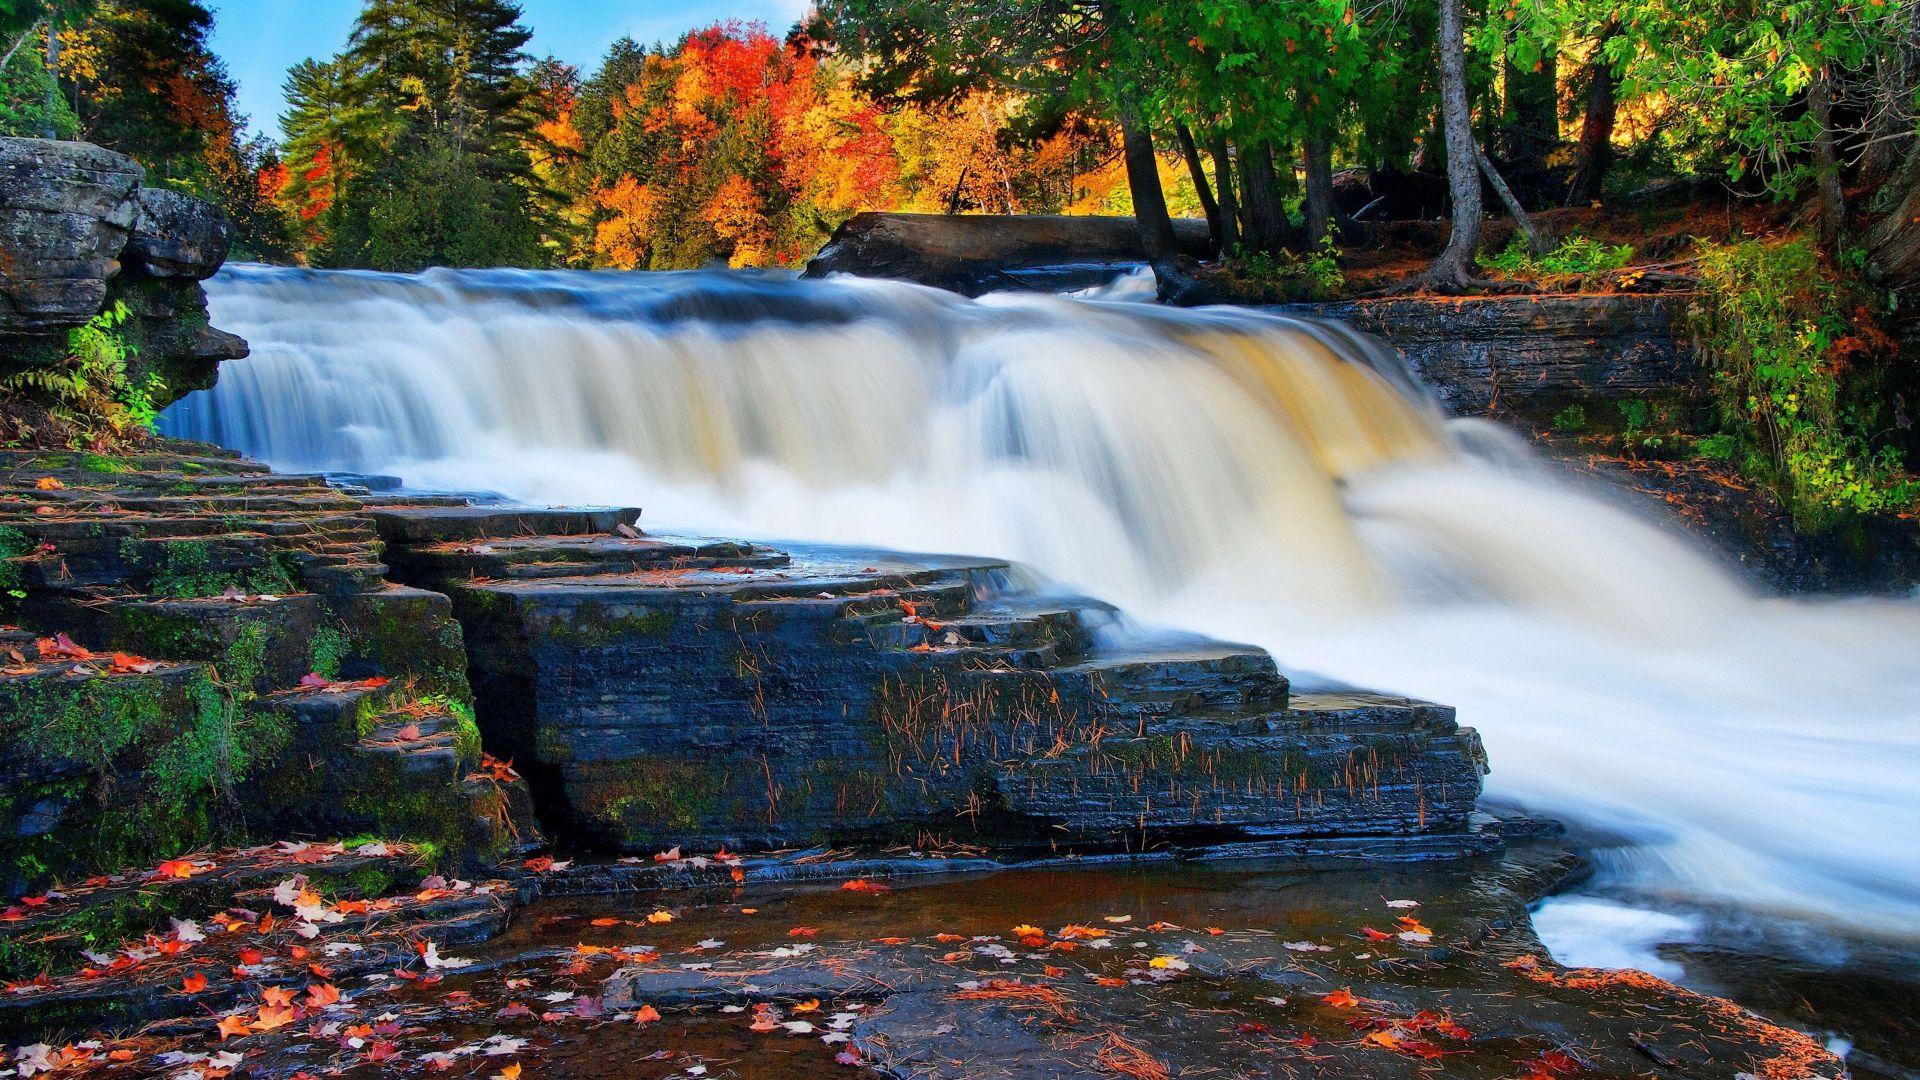 Wallpaper Forest, 5k, 4k Wallpaper, River, Waterfall